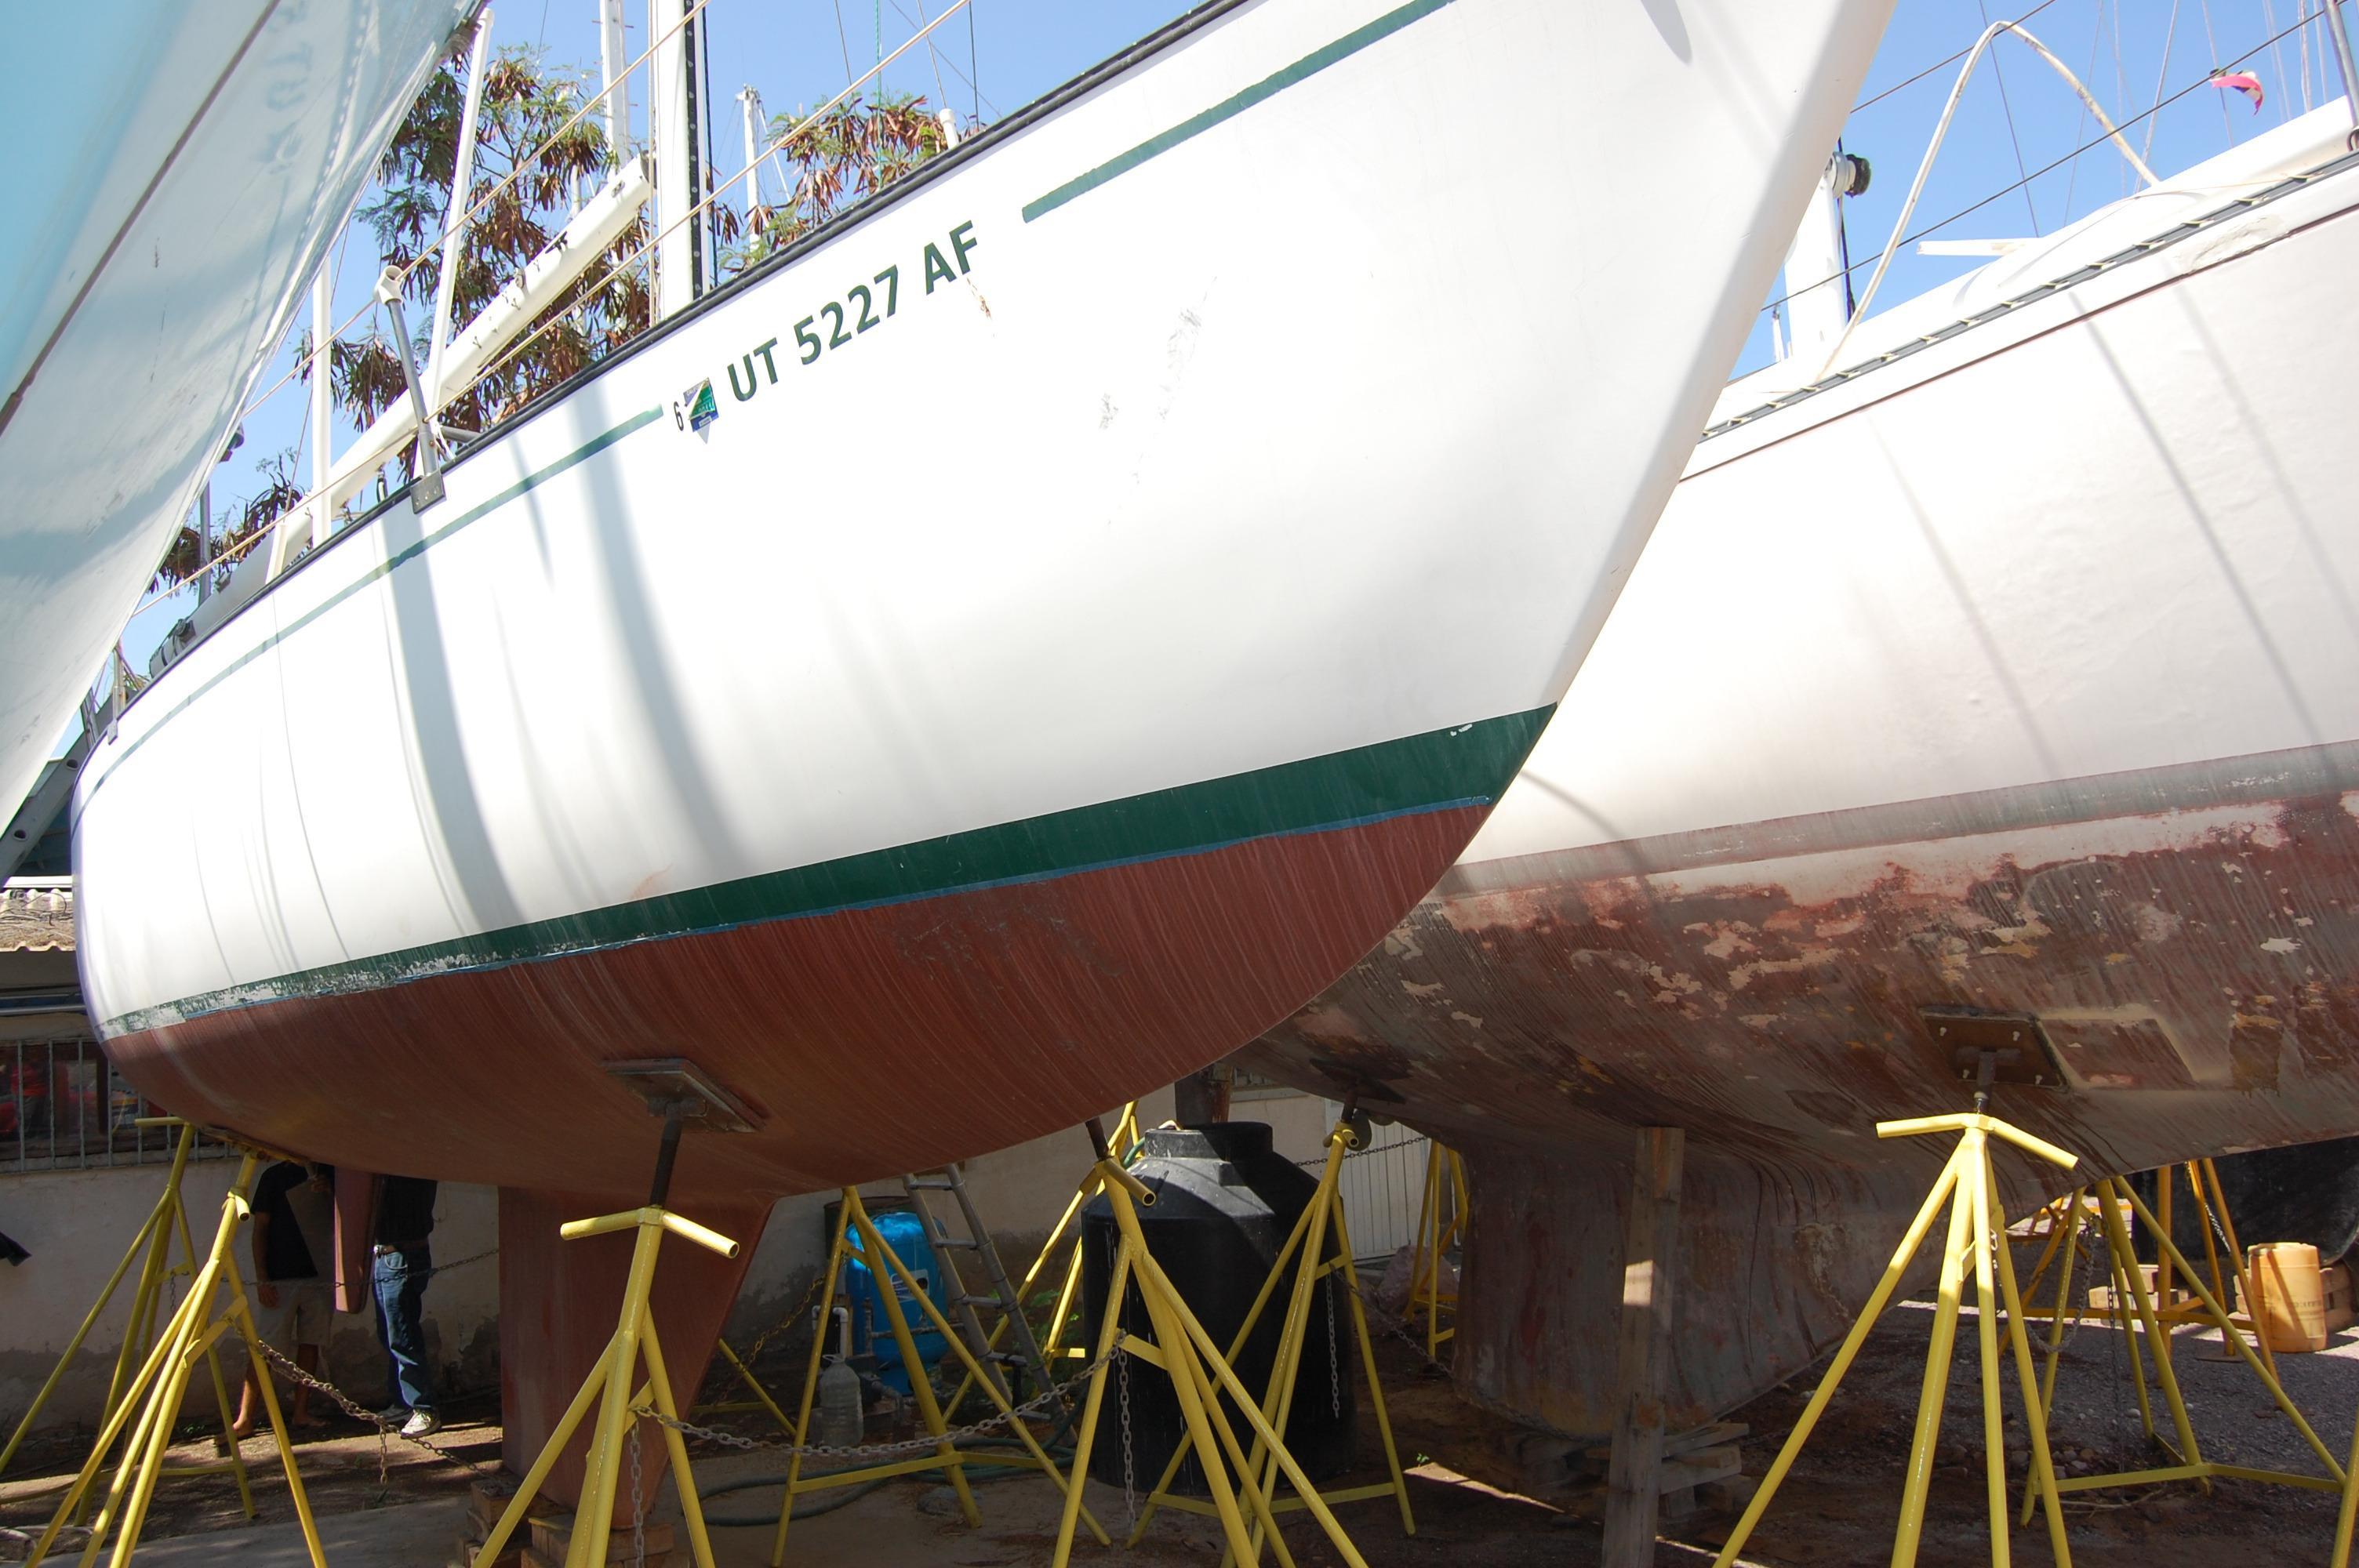 33' Ranger Yachts 33+Boat for sale!